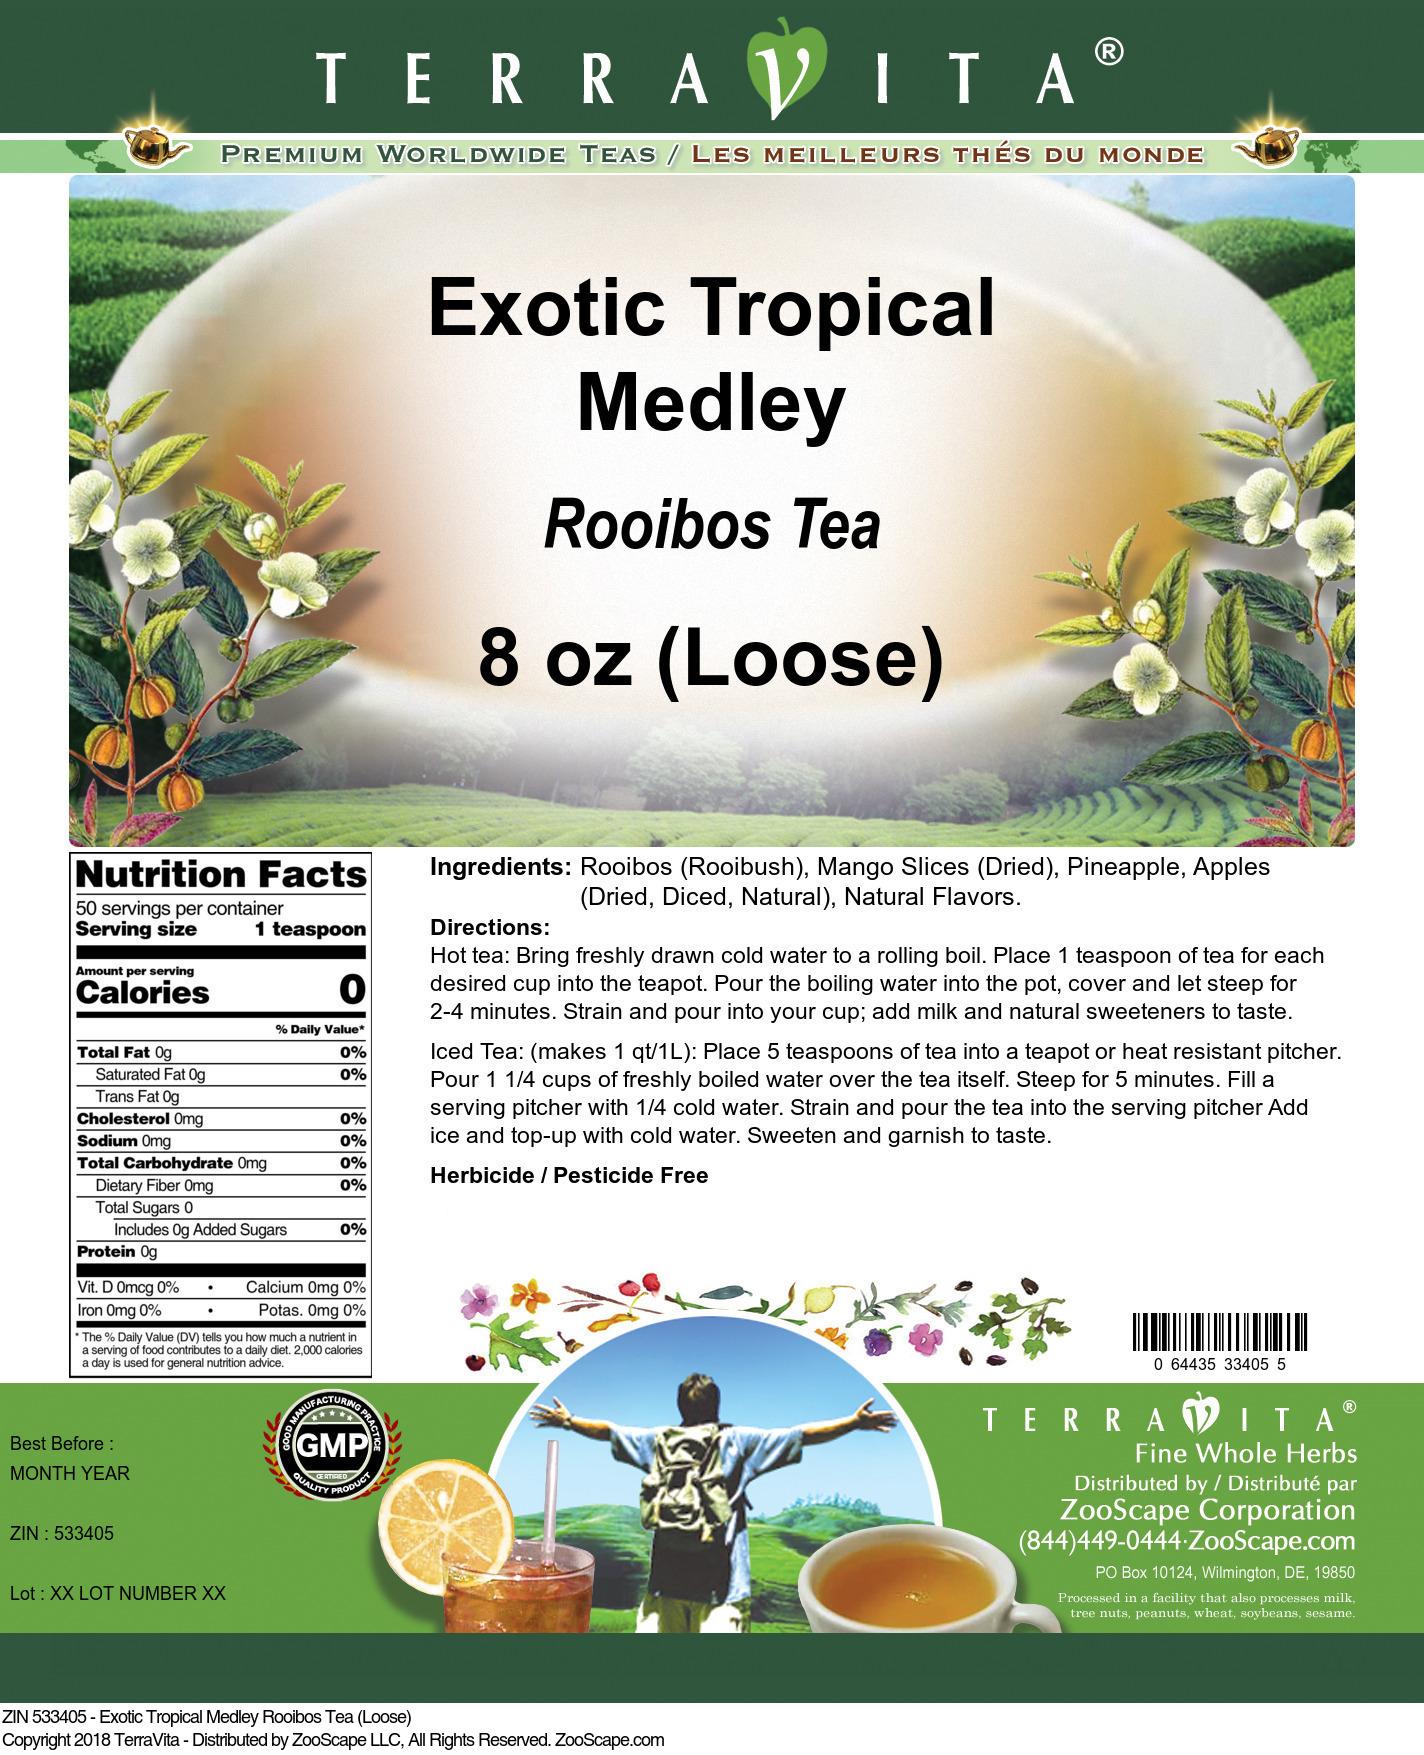 Exotic Tropical Medley Rooibos Tea